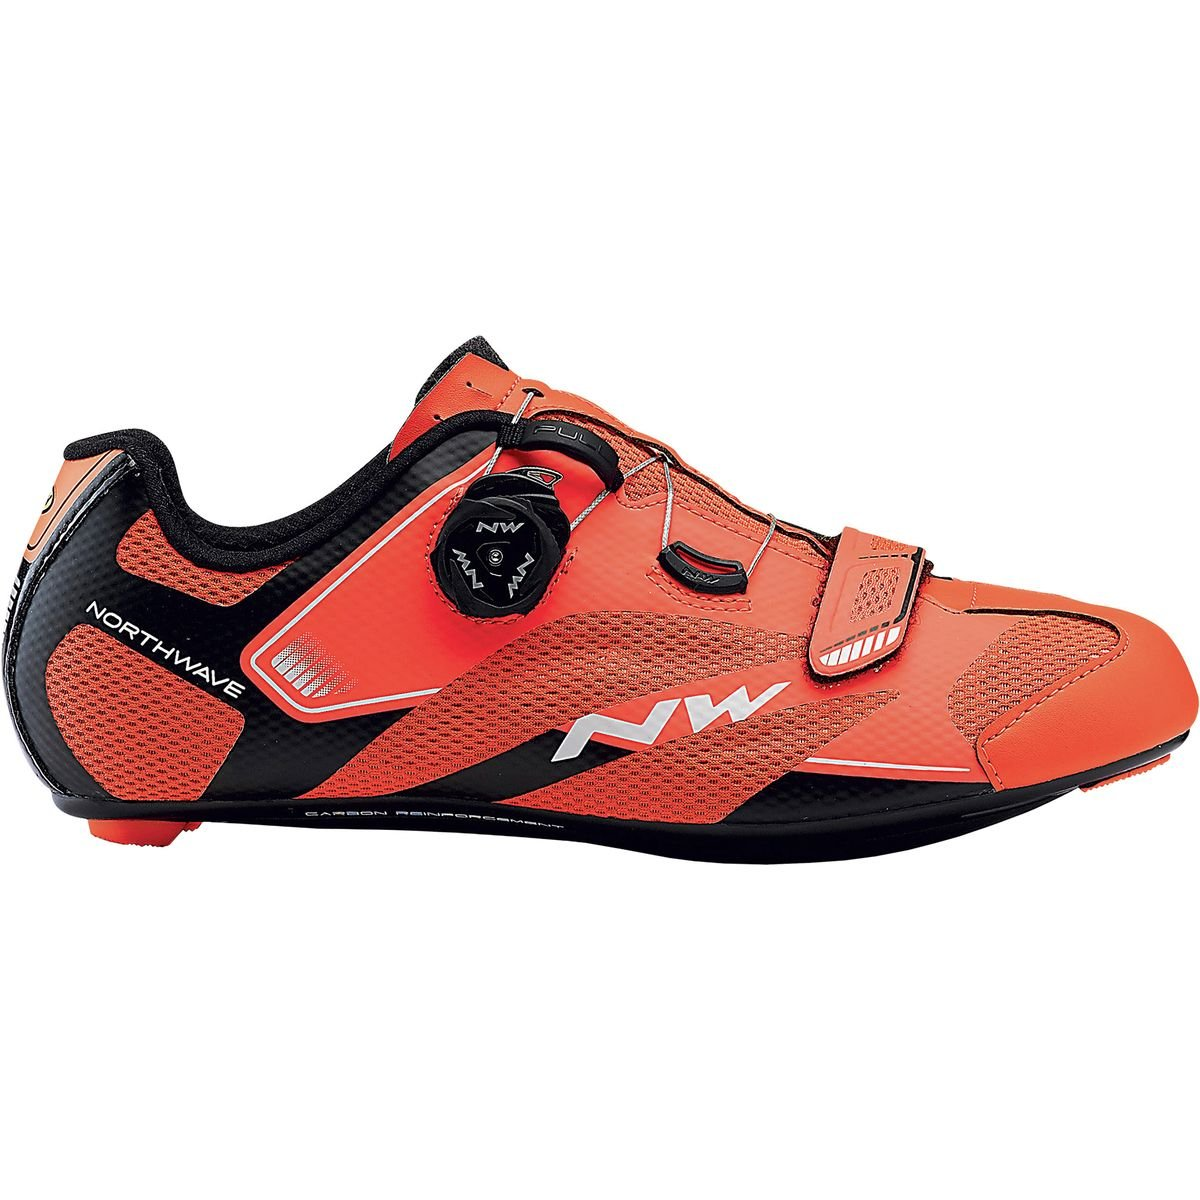 Northwave Sonic 2 Plus Cycling Shoe – Men 's Lobsterオレンジ/ブラック、41.0 B07BL2QVJ8